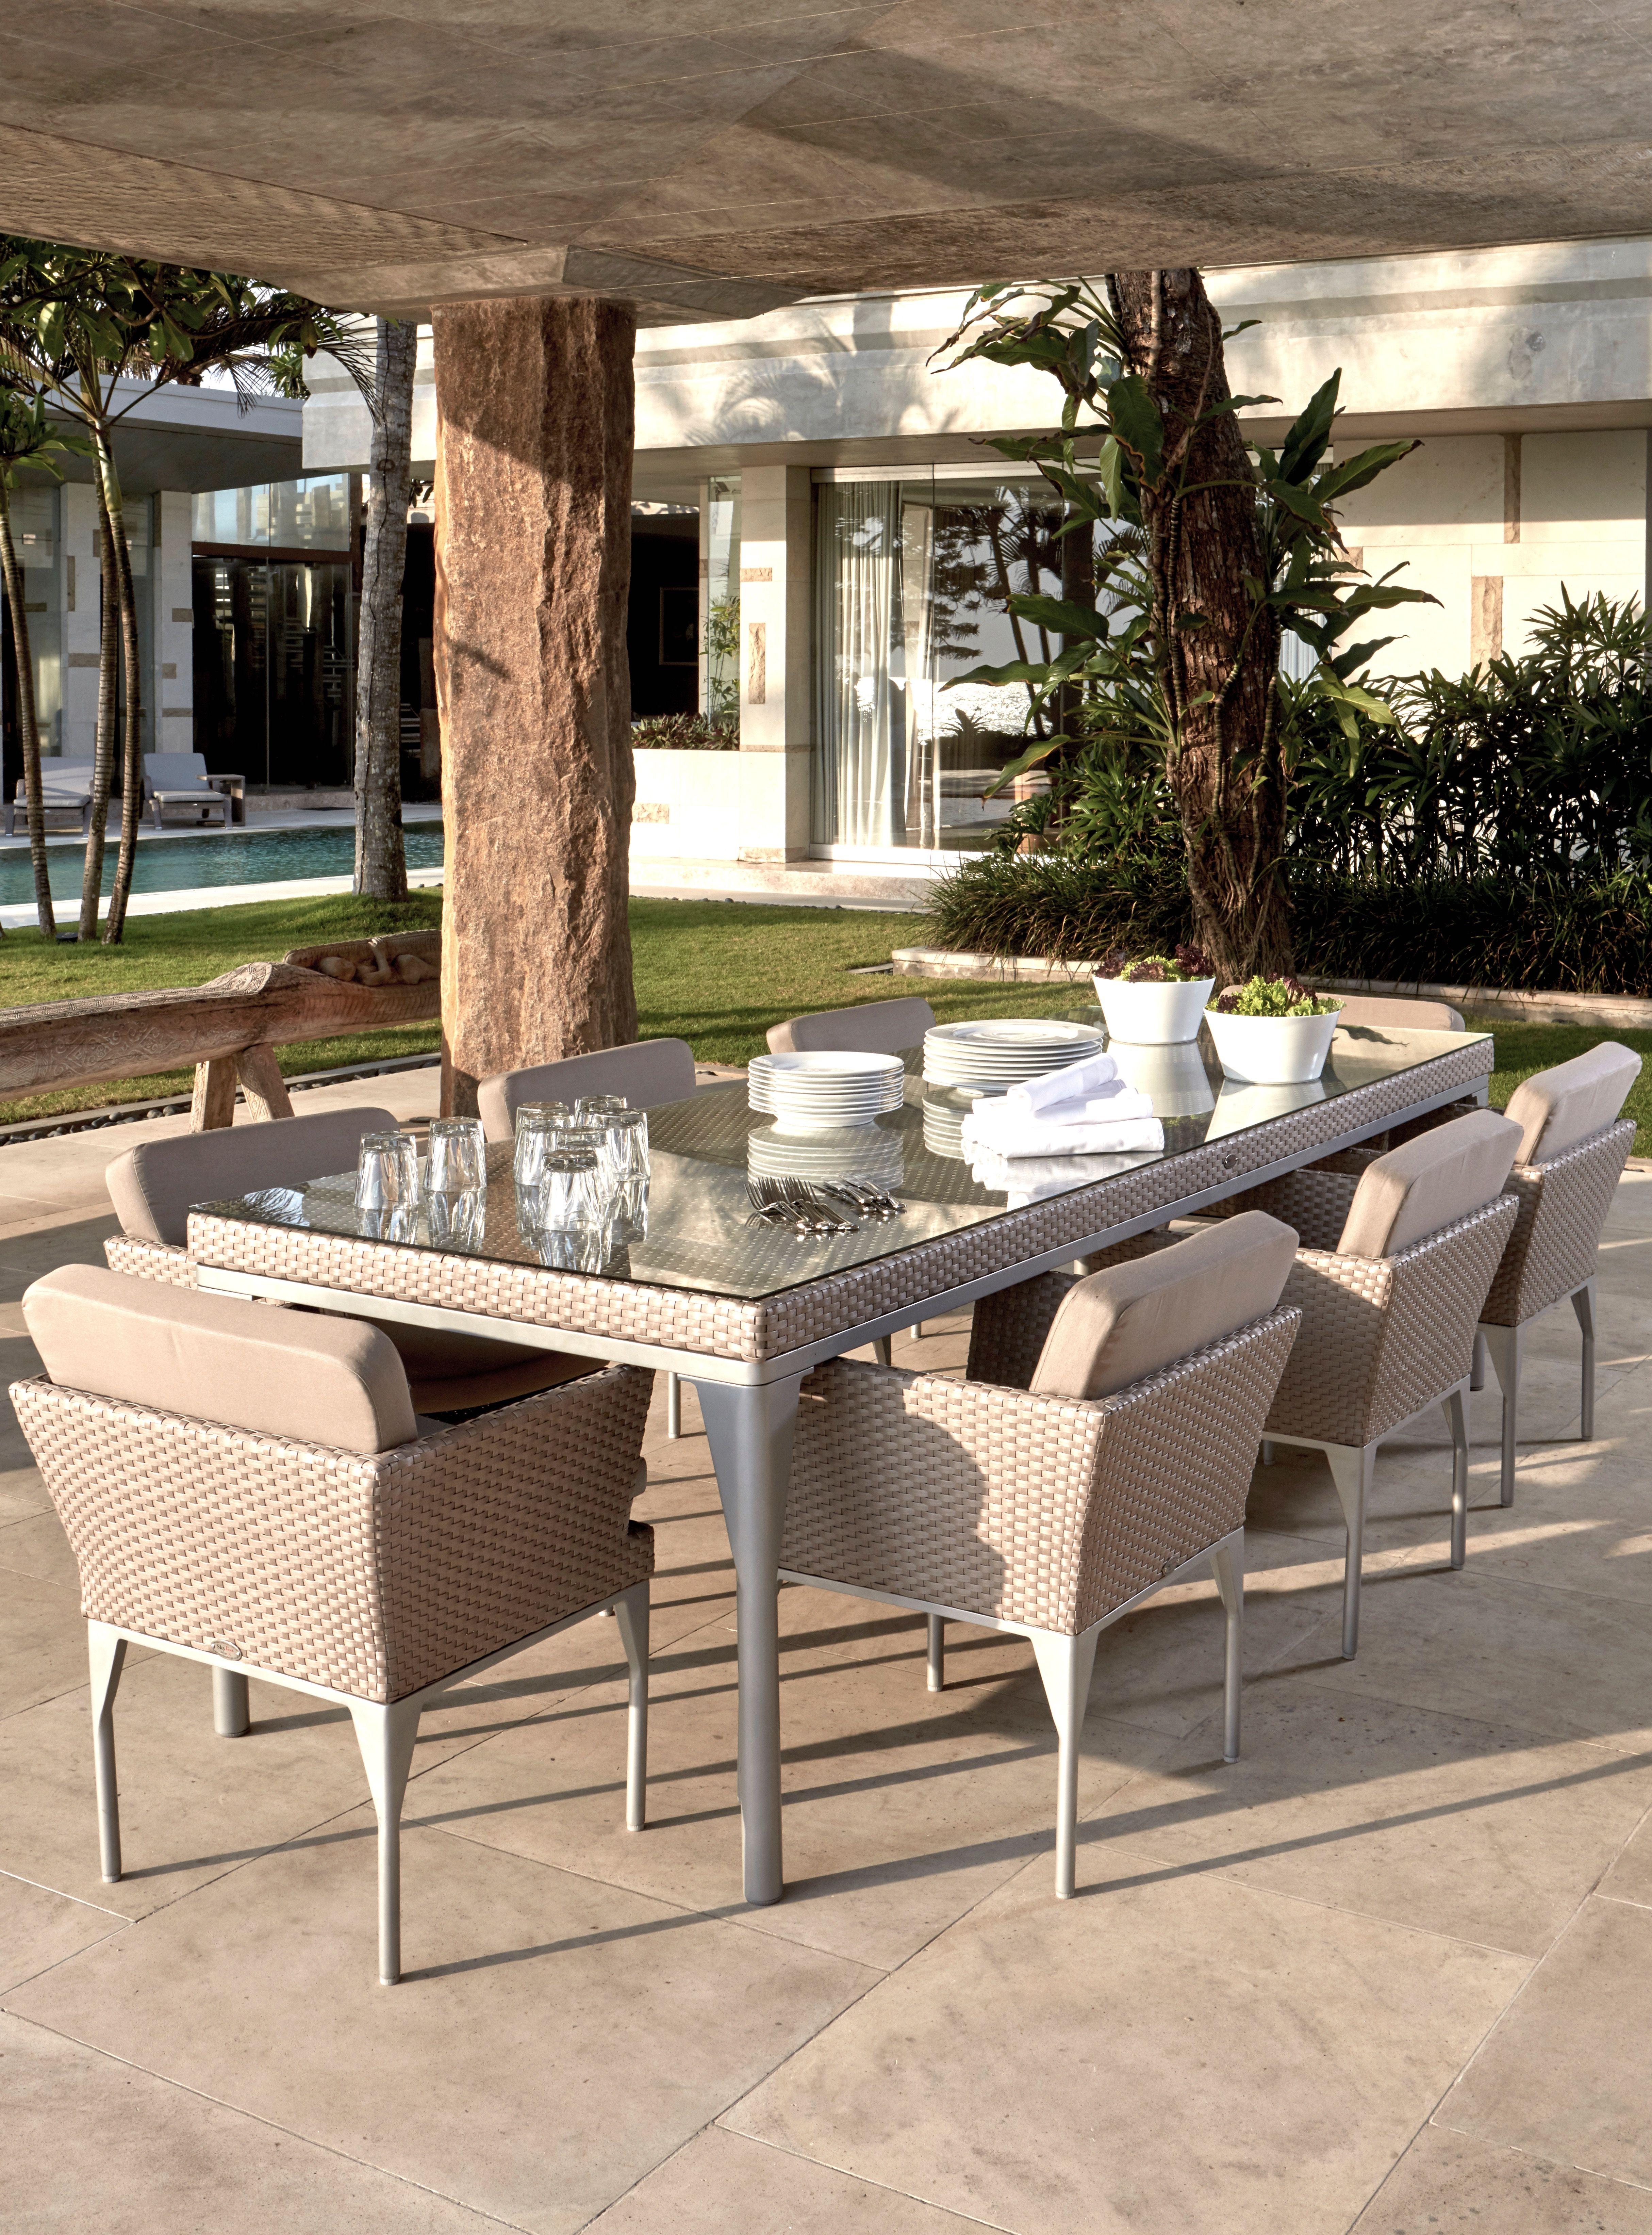 Skyline Brafta Rectangle Dining Table - Seats 8 - Luxury ... on Fine Living Patio Set id=64763